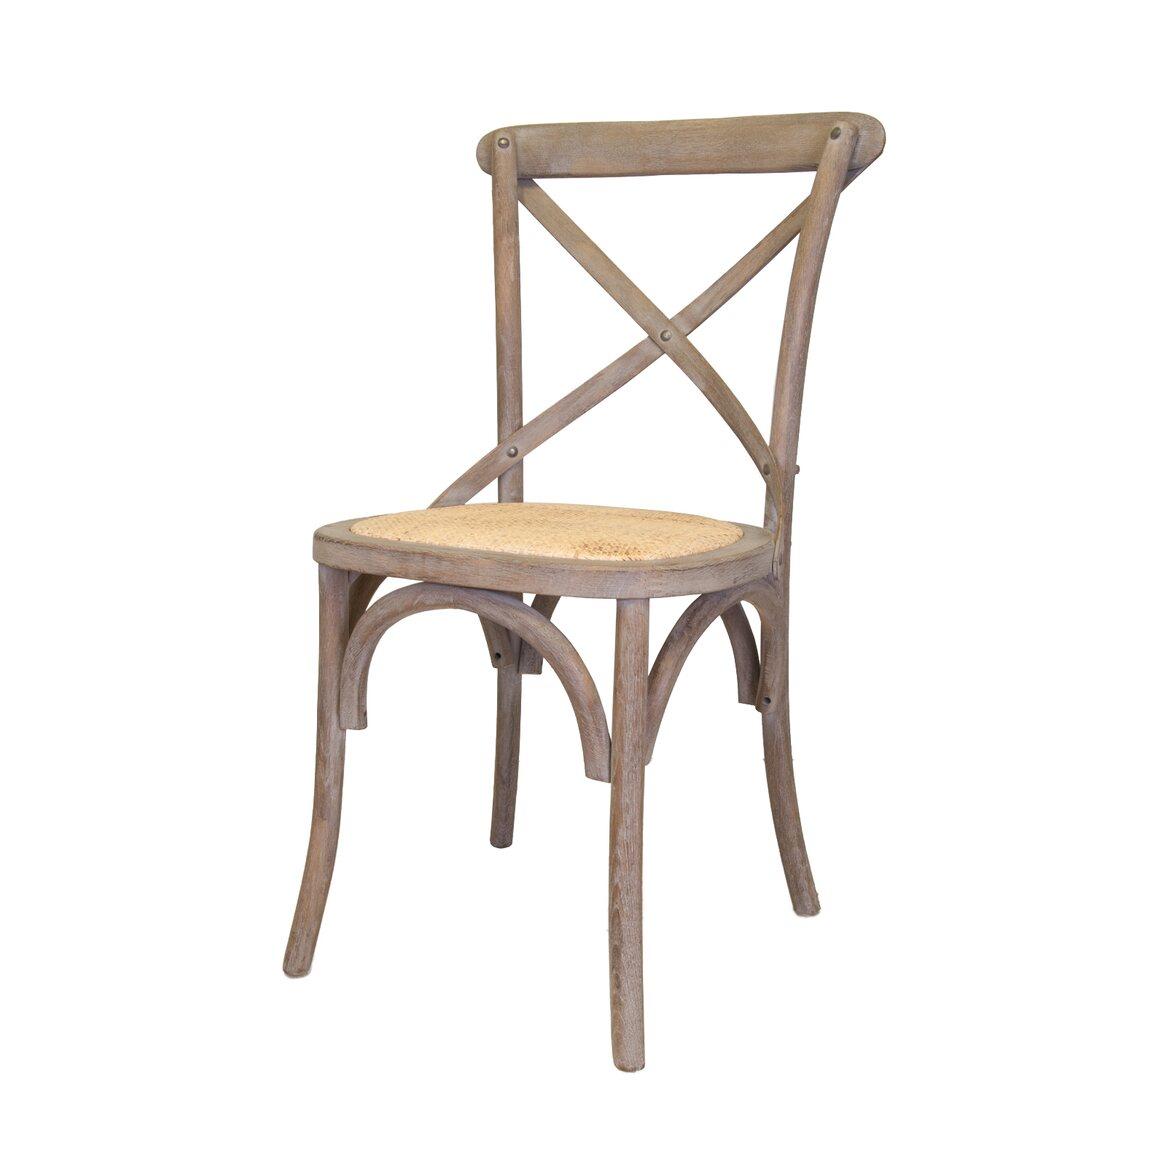 Стул Cross back old 4 | Обеденные стулья Kingsby